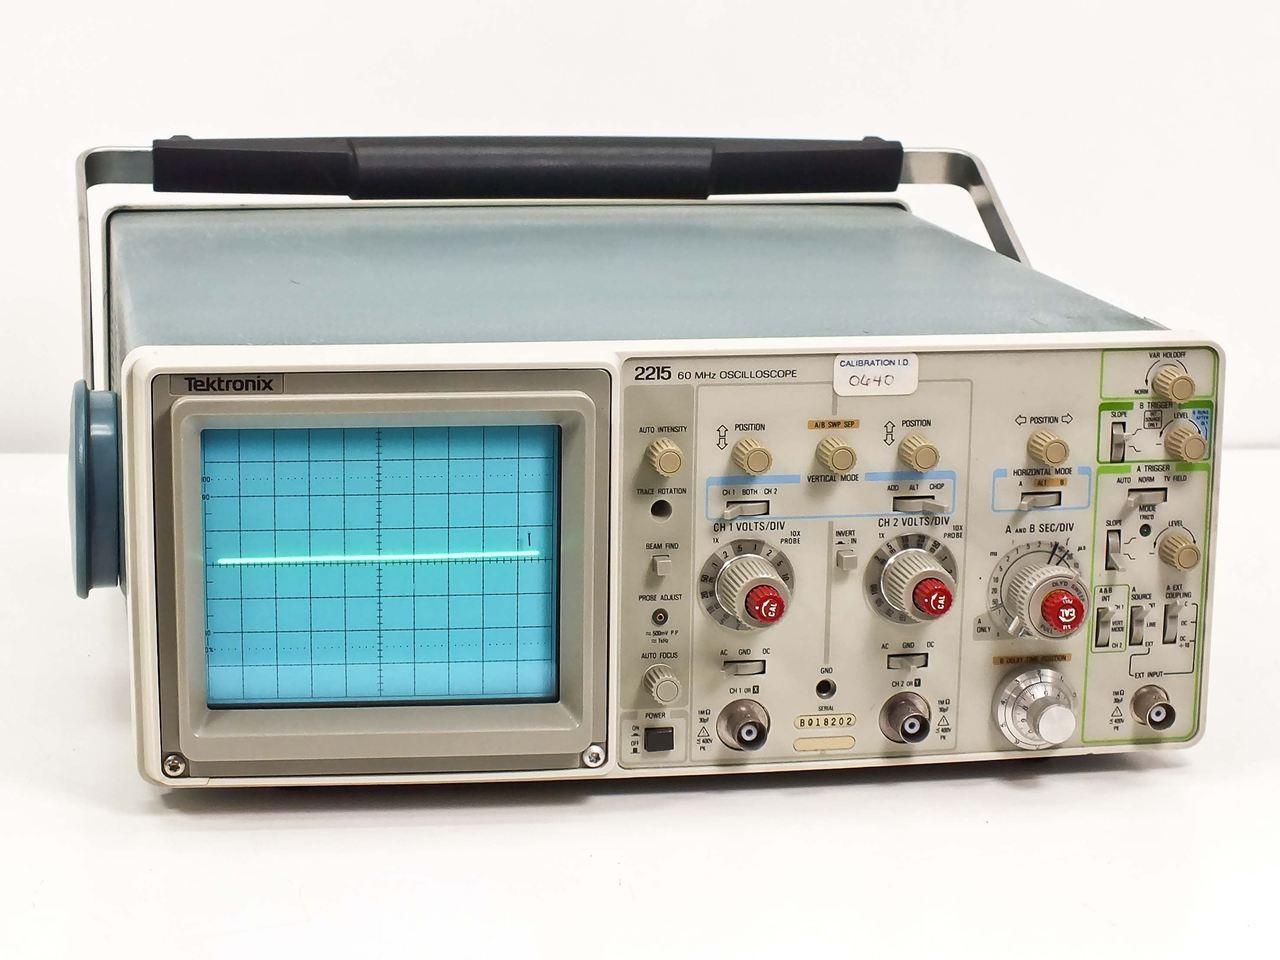 Tektronix 2215 60MHz Oscilloscope ...